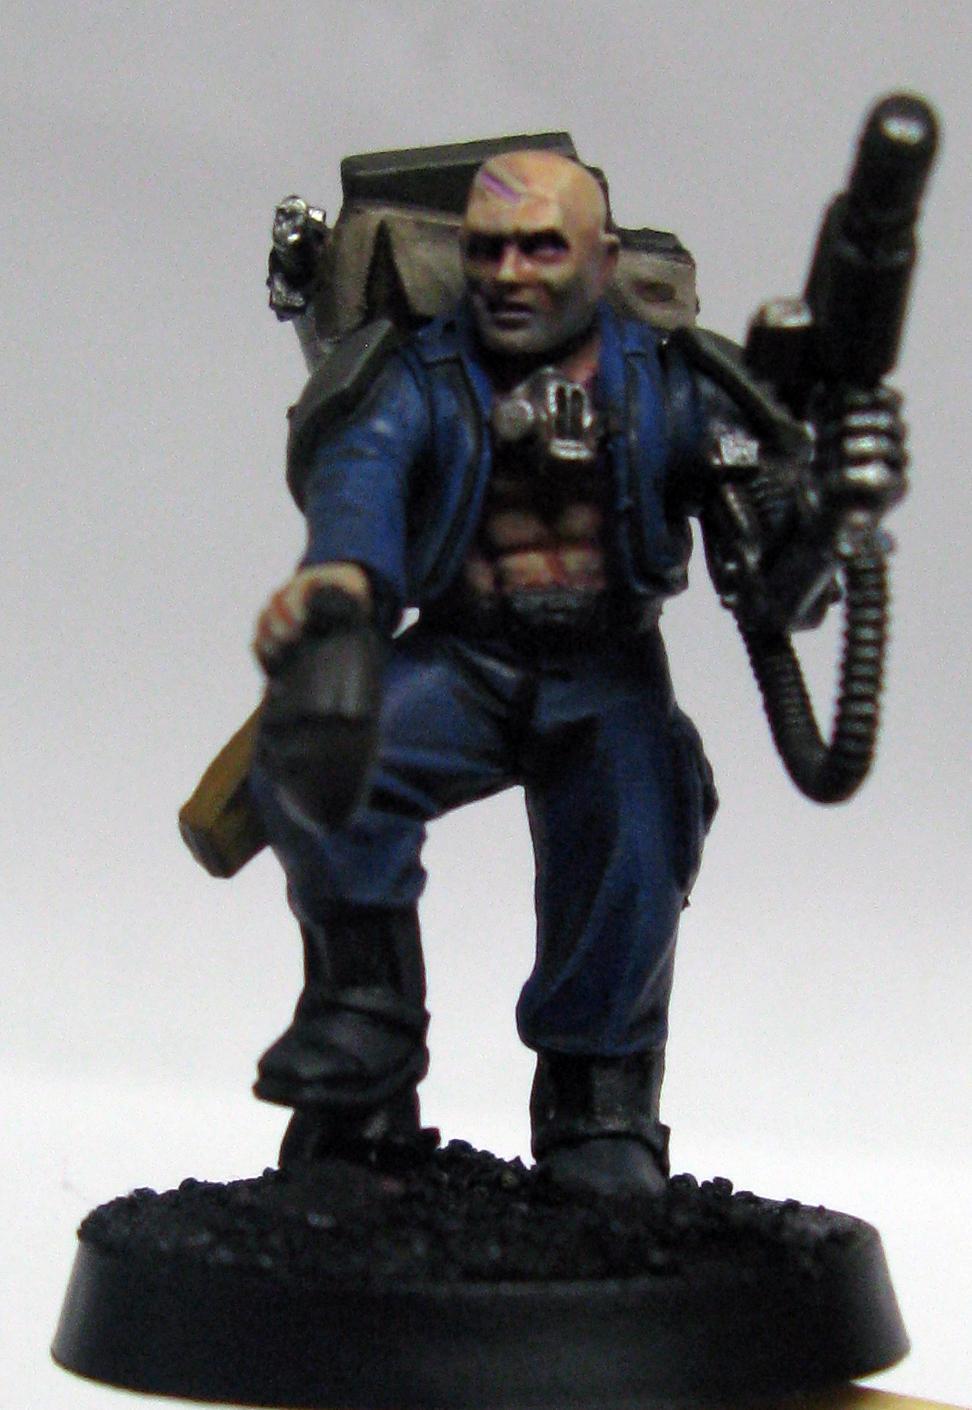 Alcatran, Bionics, Bodyguard, Fluff, Hellpistol, Imperial Guard, Veteran, Work In Progress